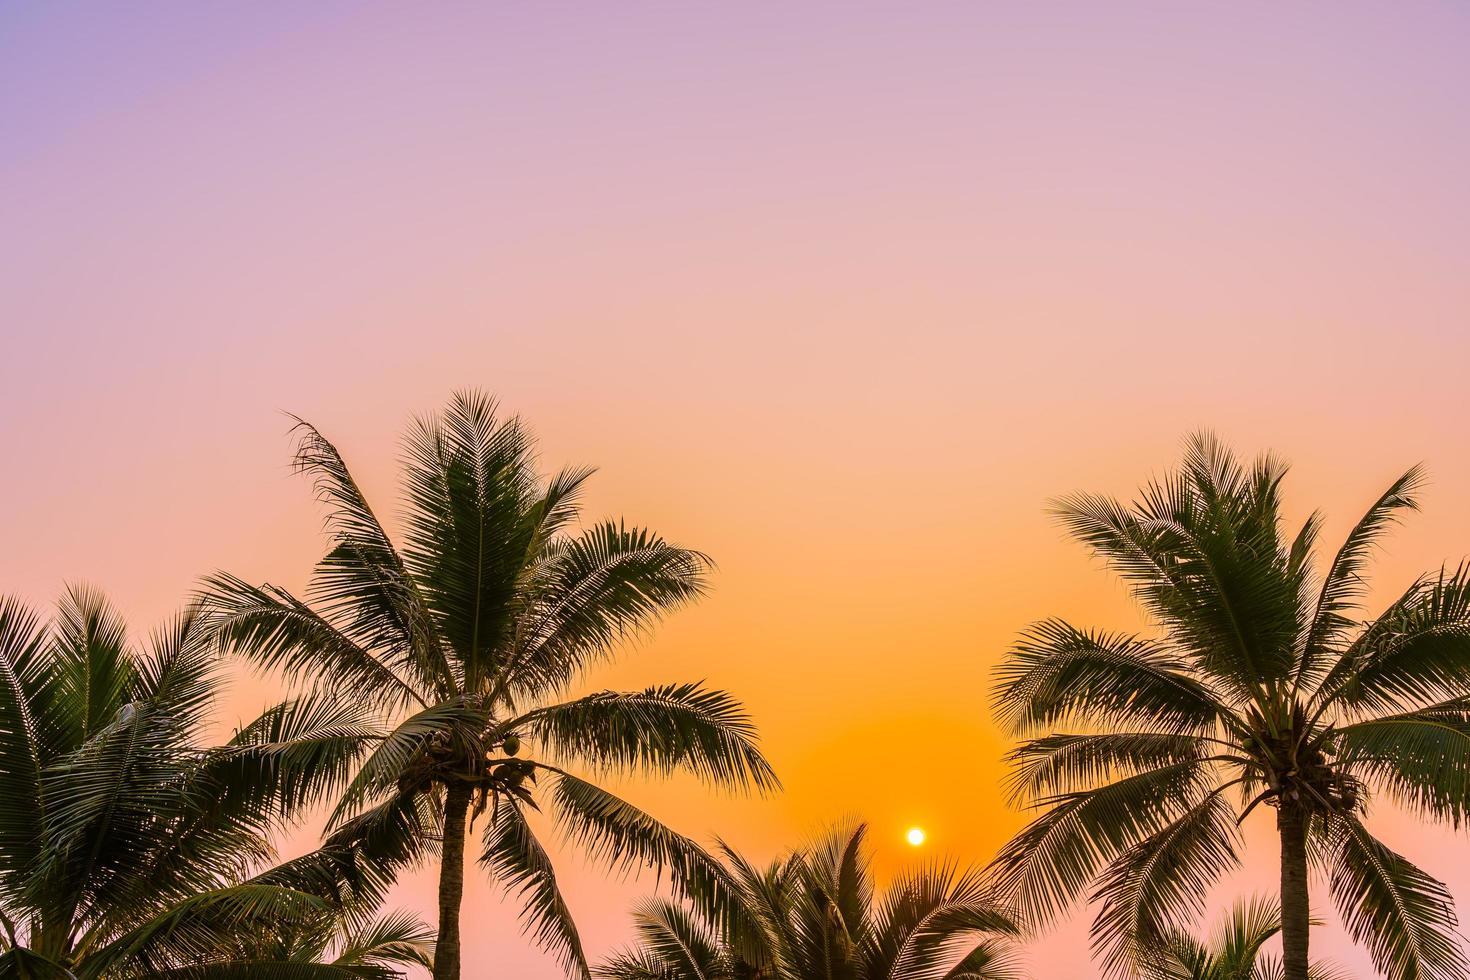 palmer vid havet foto